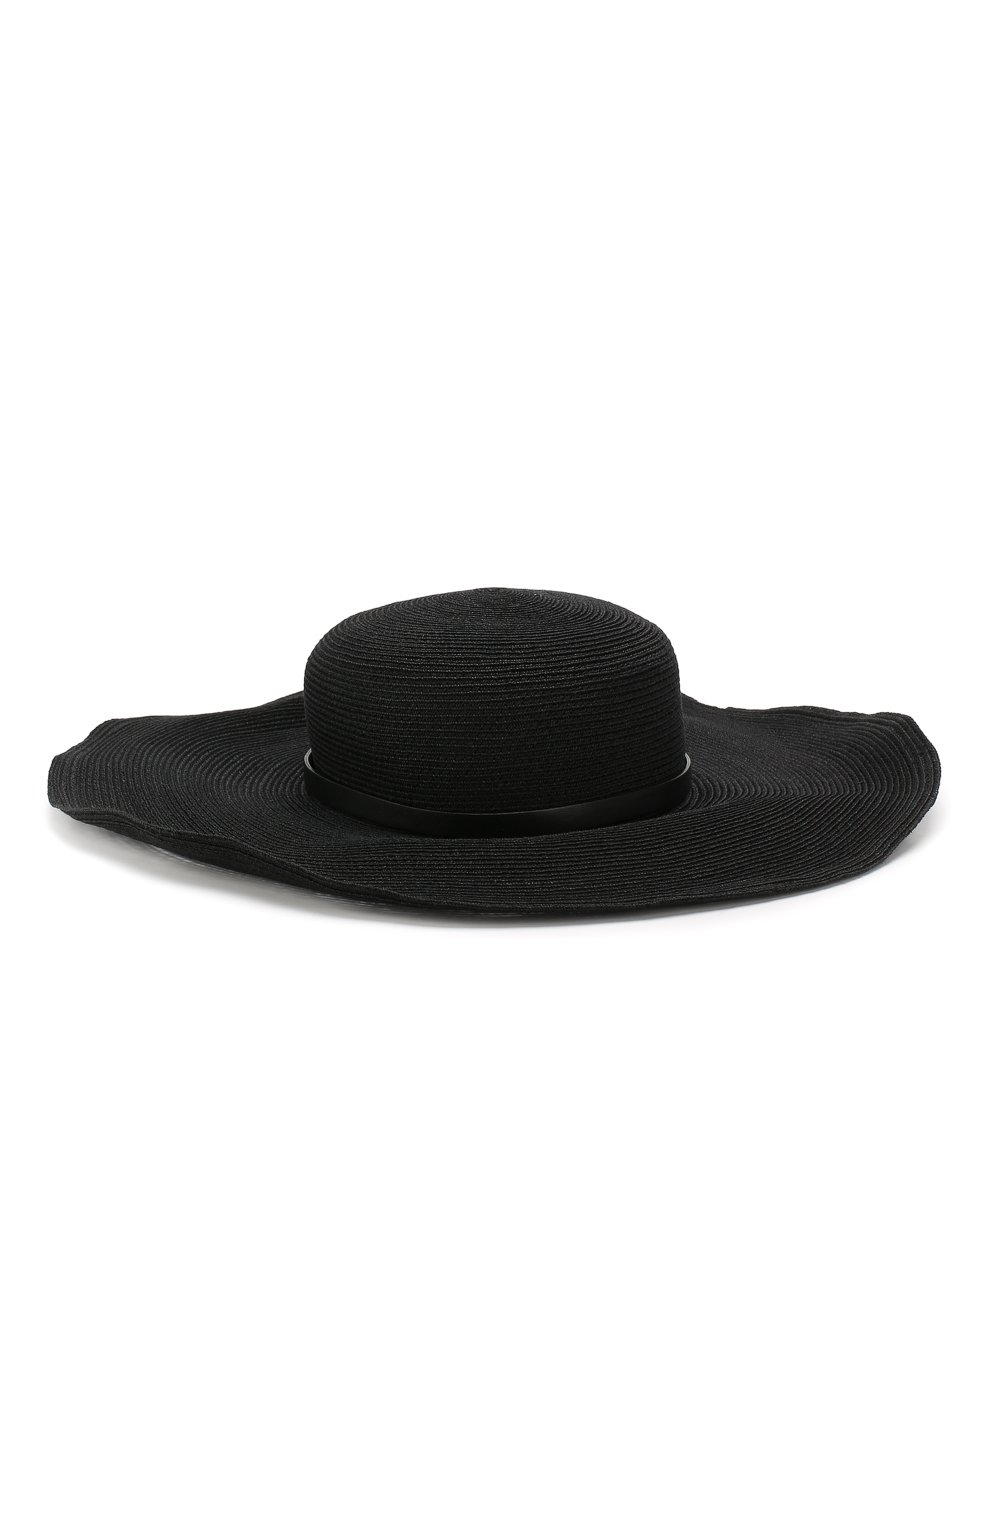 Шляпа с декоративным ремешком Inverni черного цвета   Фото №2